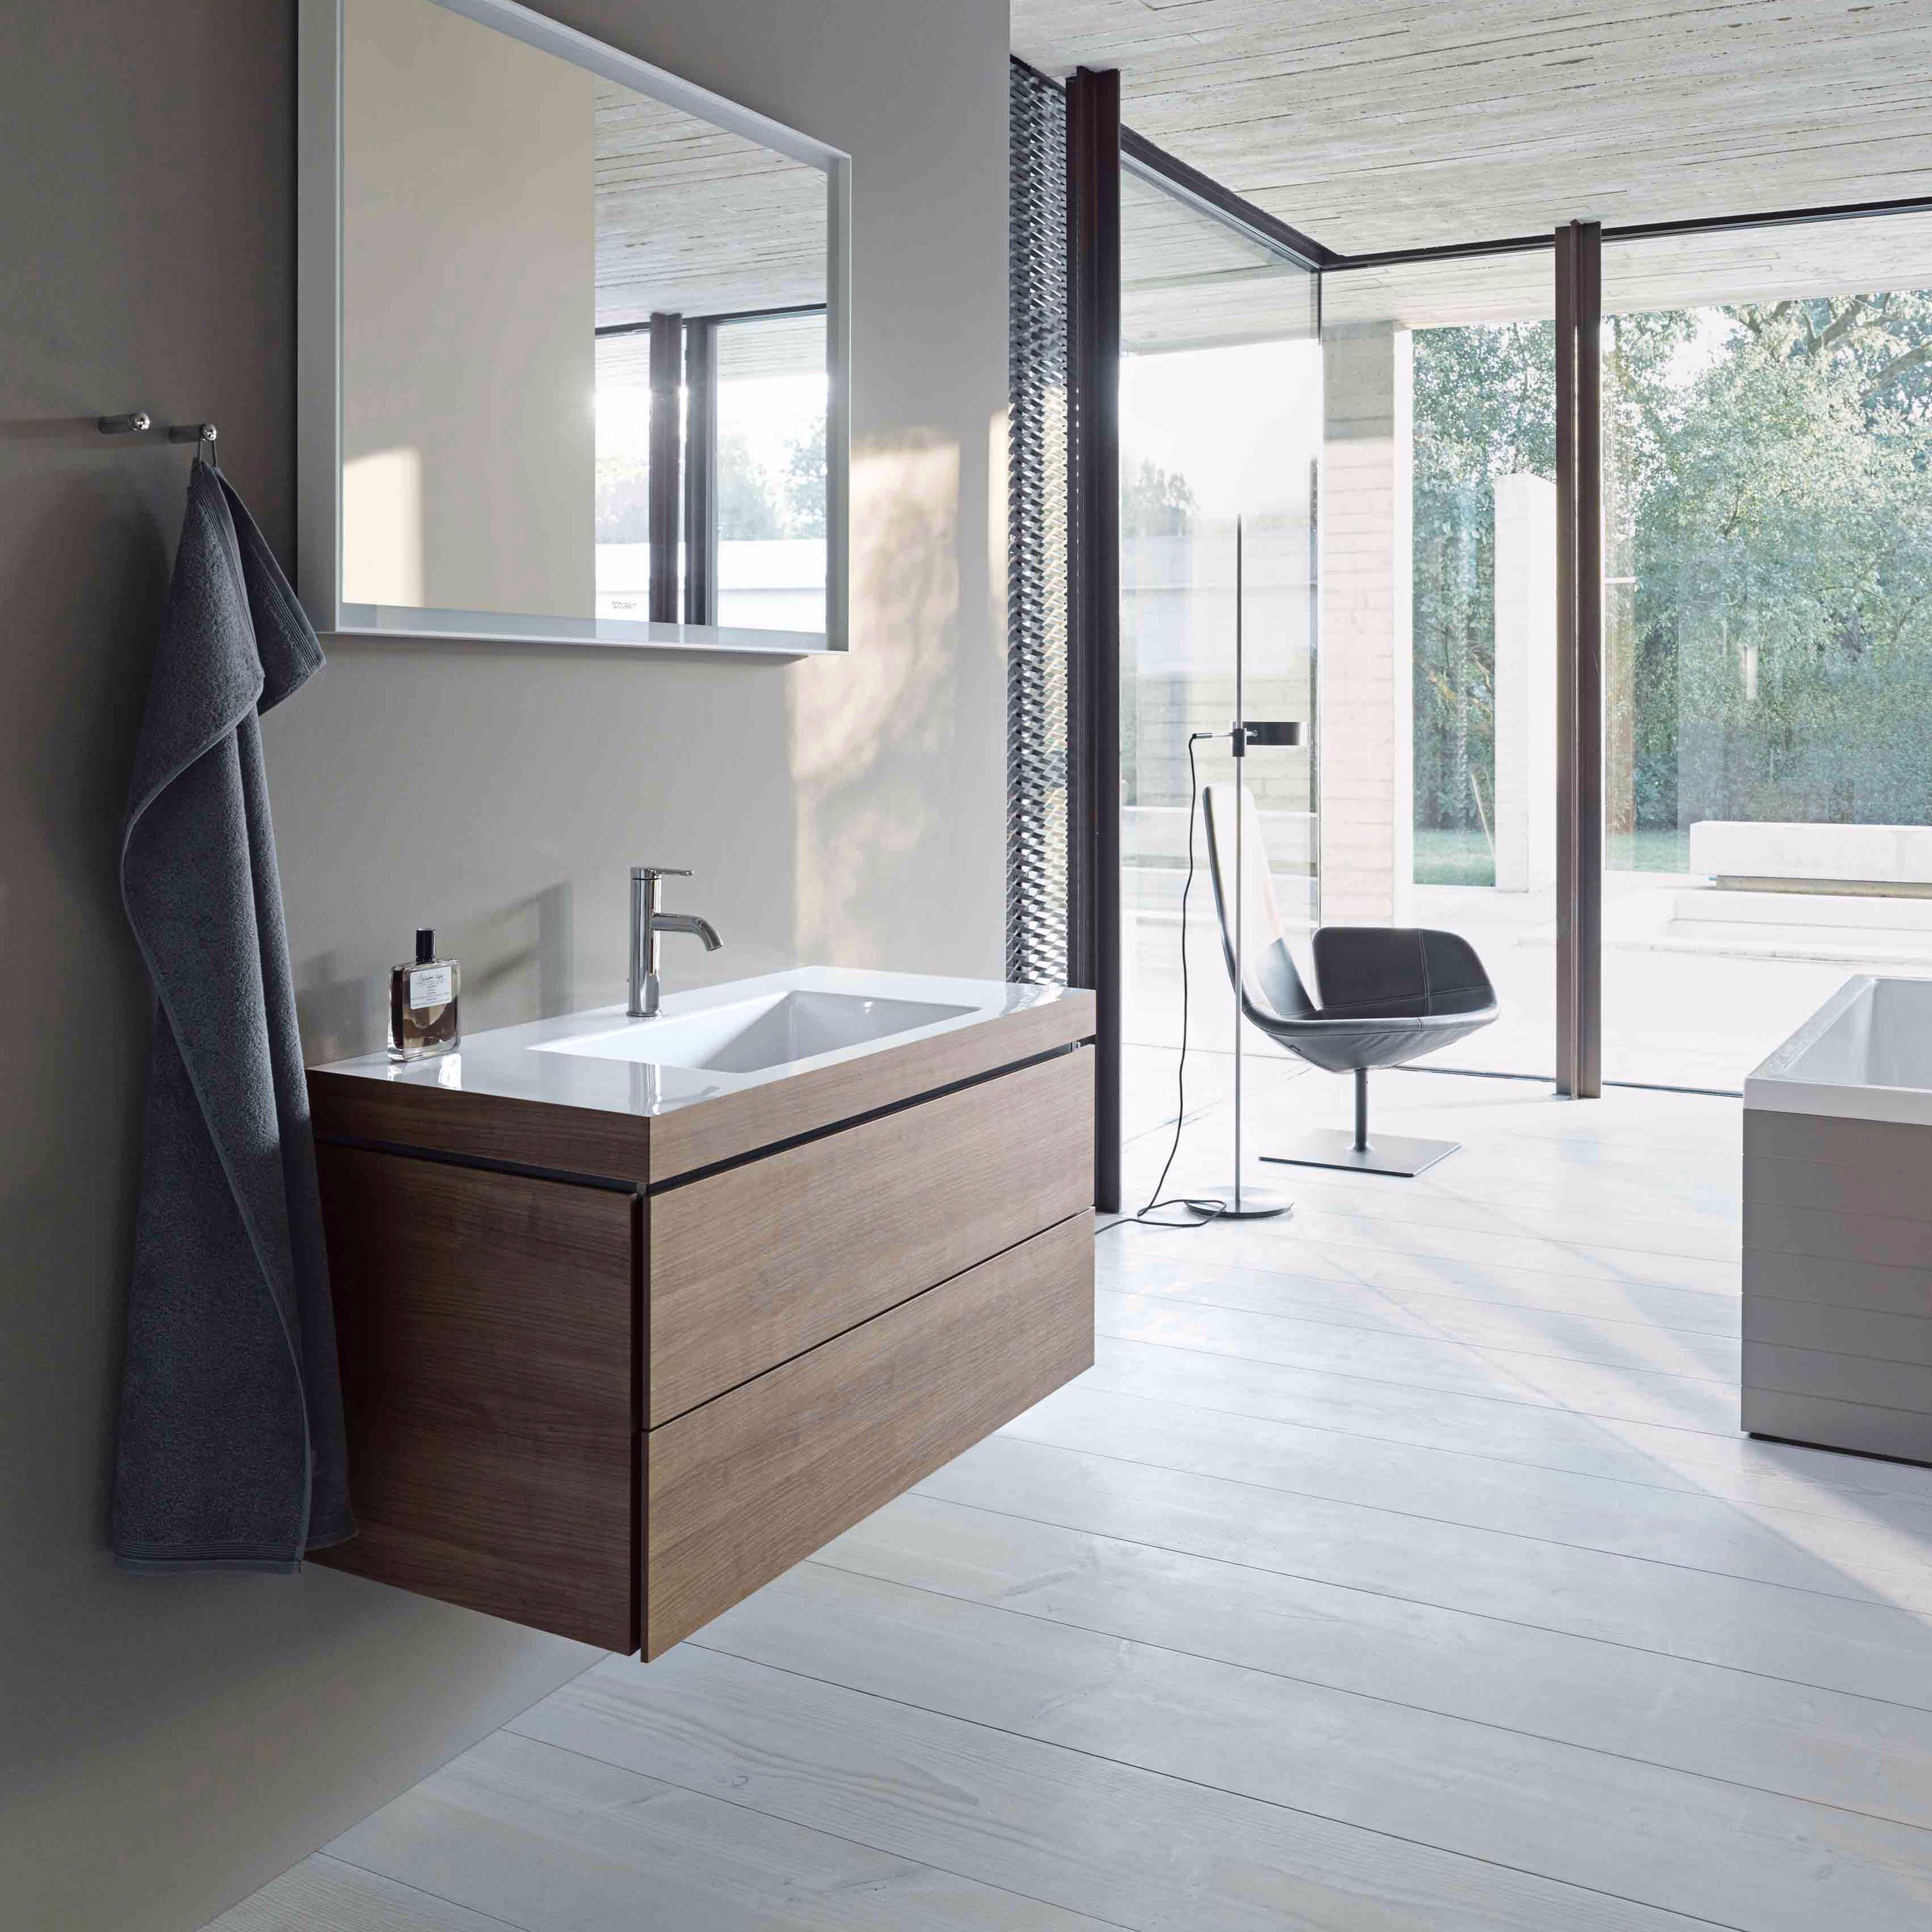 DURAVIT L-Cube комплект мебели, Тумба C-bonded, раковина  с фронтом, 50см, цвет: Американский орех